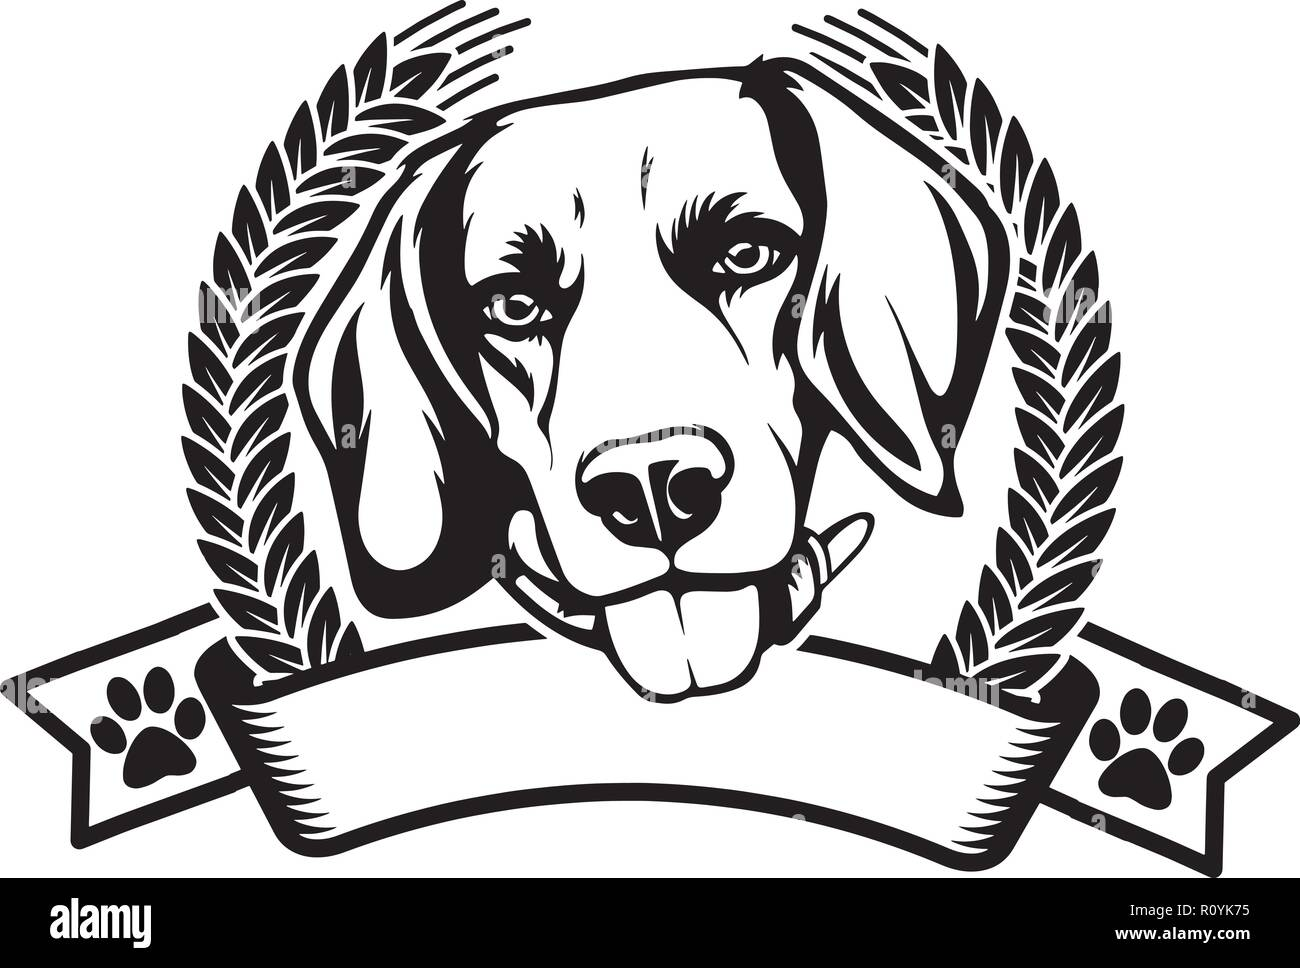 Beagle Dog Breed Head Isolated Pedigree Pet Portrait Smiling Happy Puppy Face Animal Cartoon Illustration Portrait Art Artwork Cute Design - Stock Image